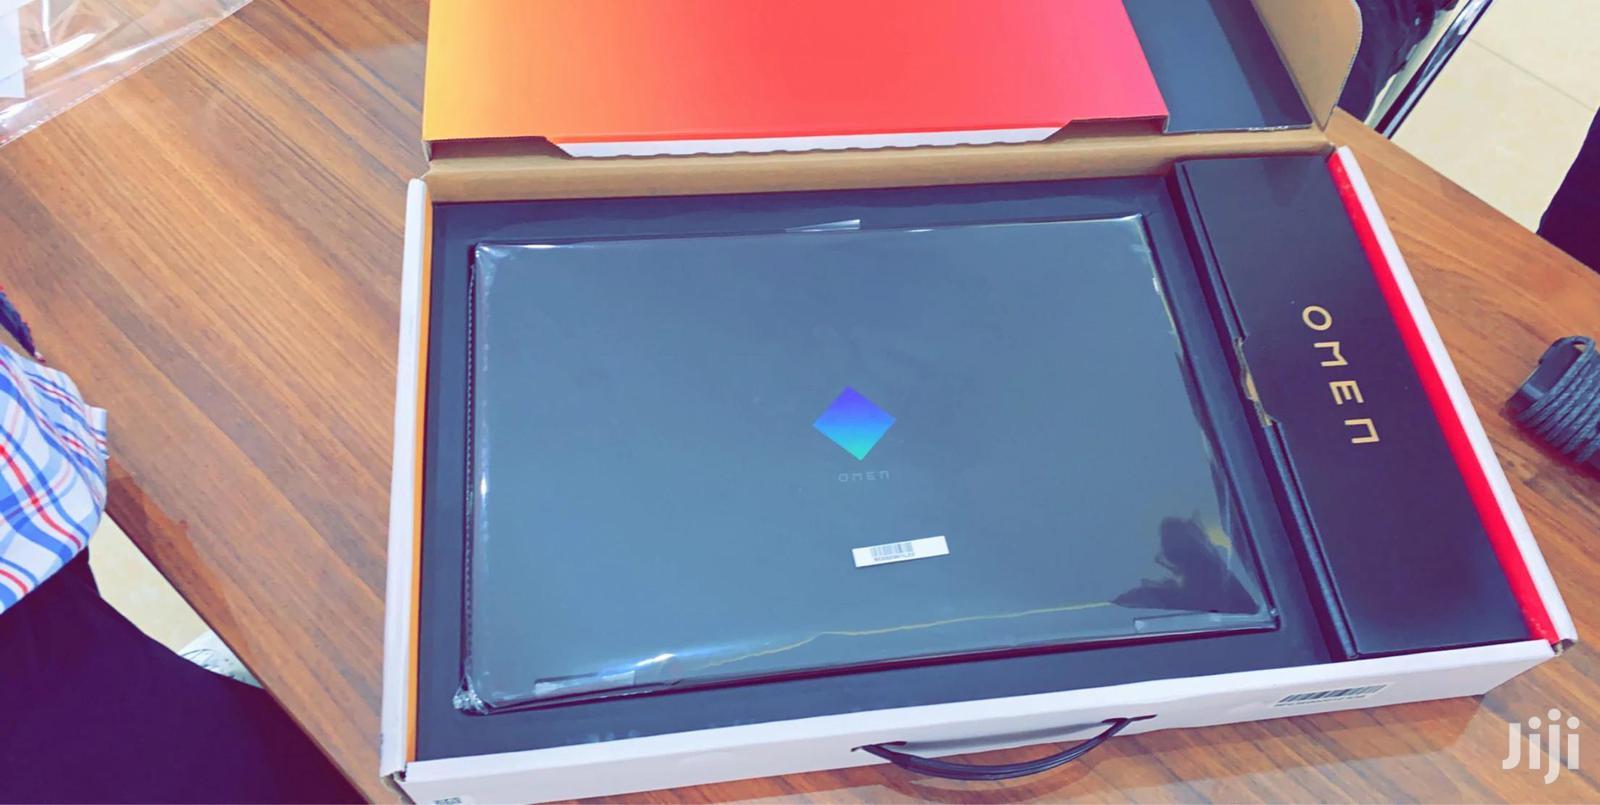 New Laptop HP Omen 15 16GB Intel Core i7 SSD 512GB | Laptops & Computers for sale in Accra Metropolitan, Greater Accra, Ghana